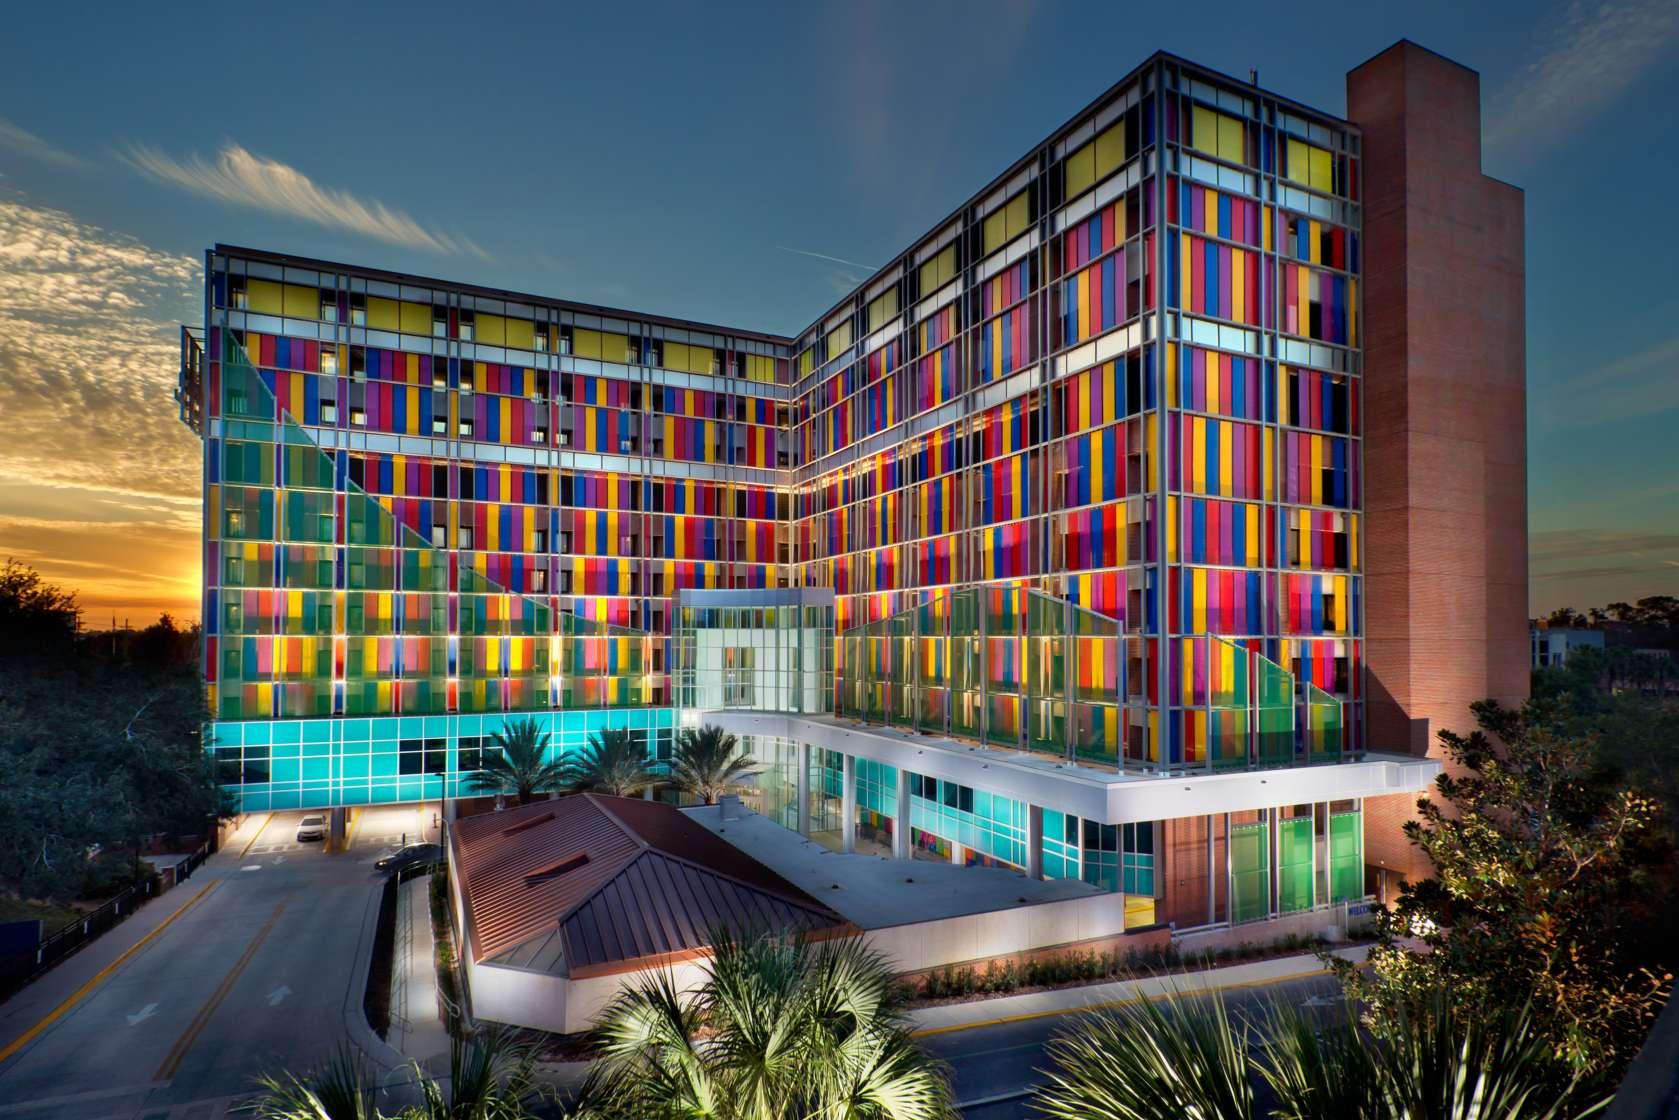 UF Health Shands Children's Hospital at night